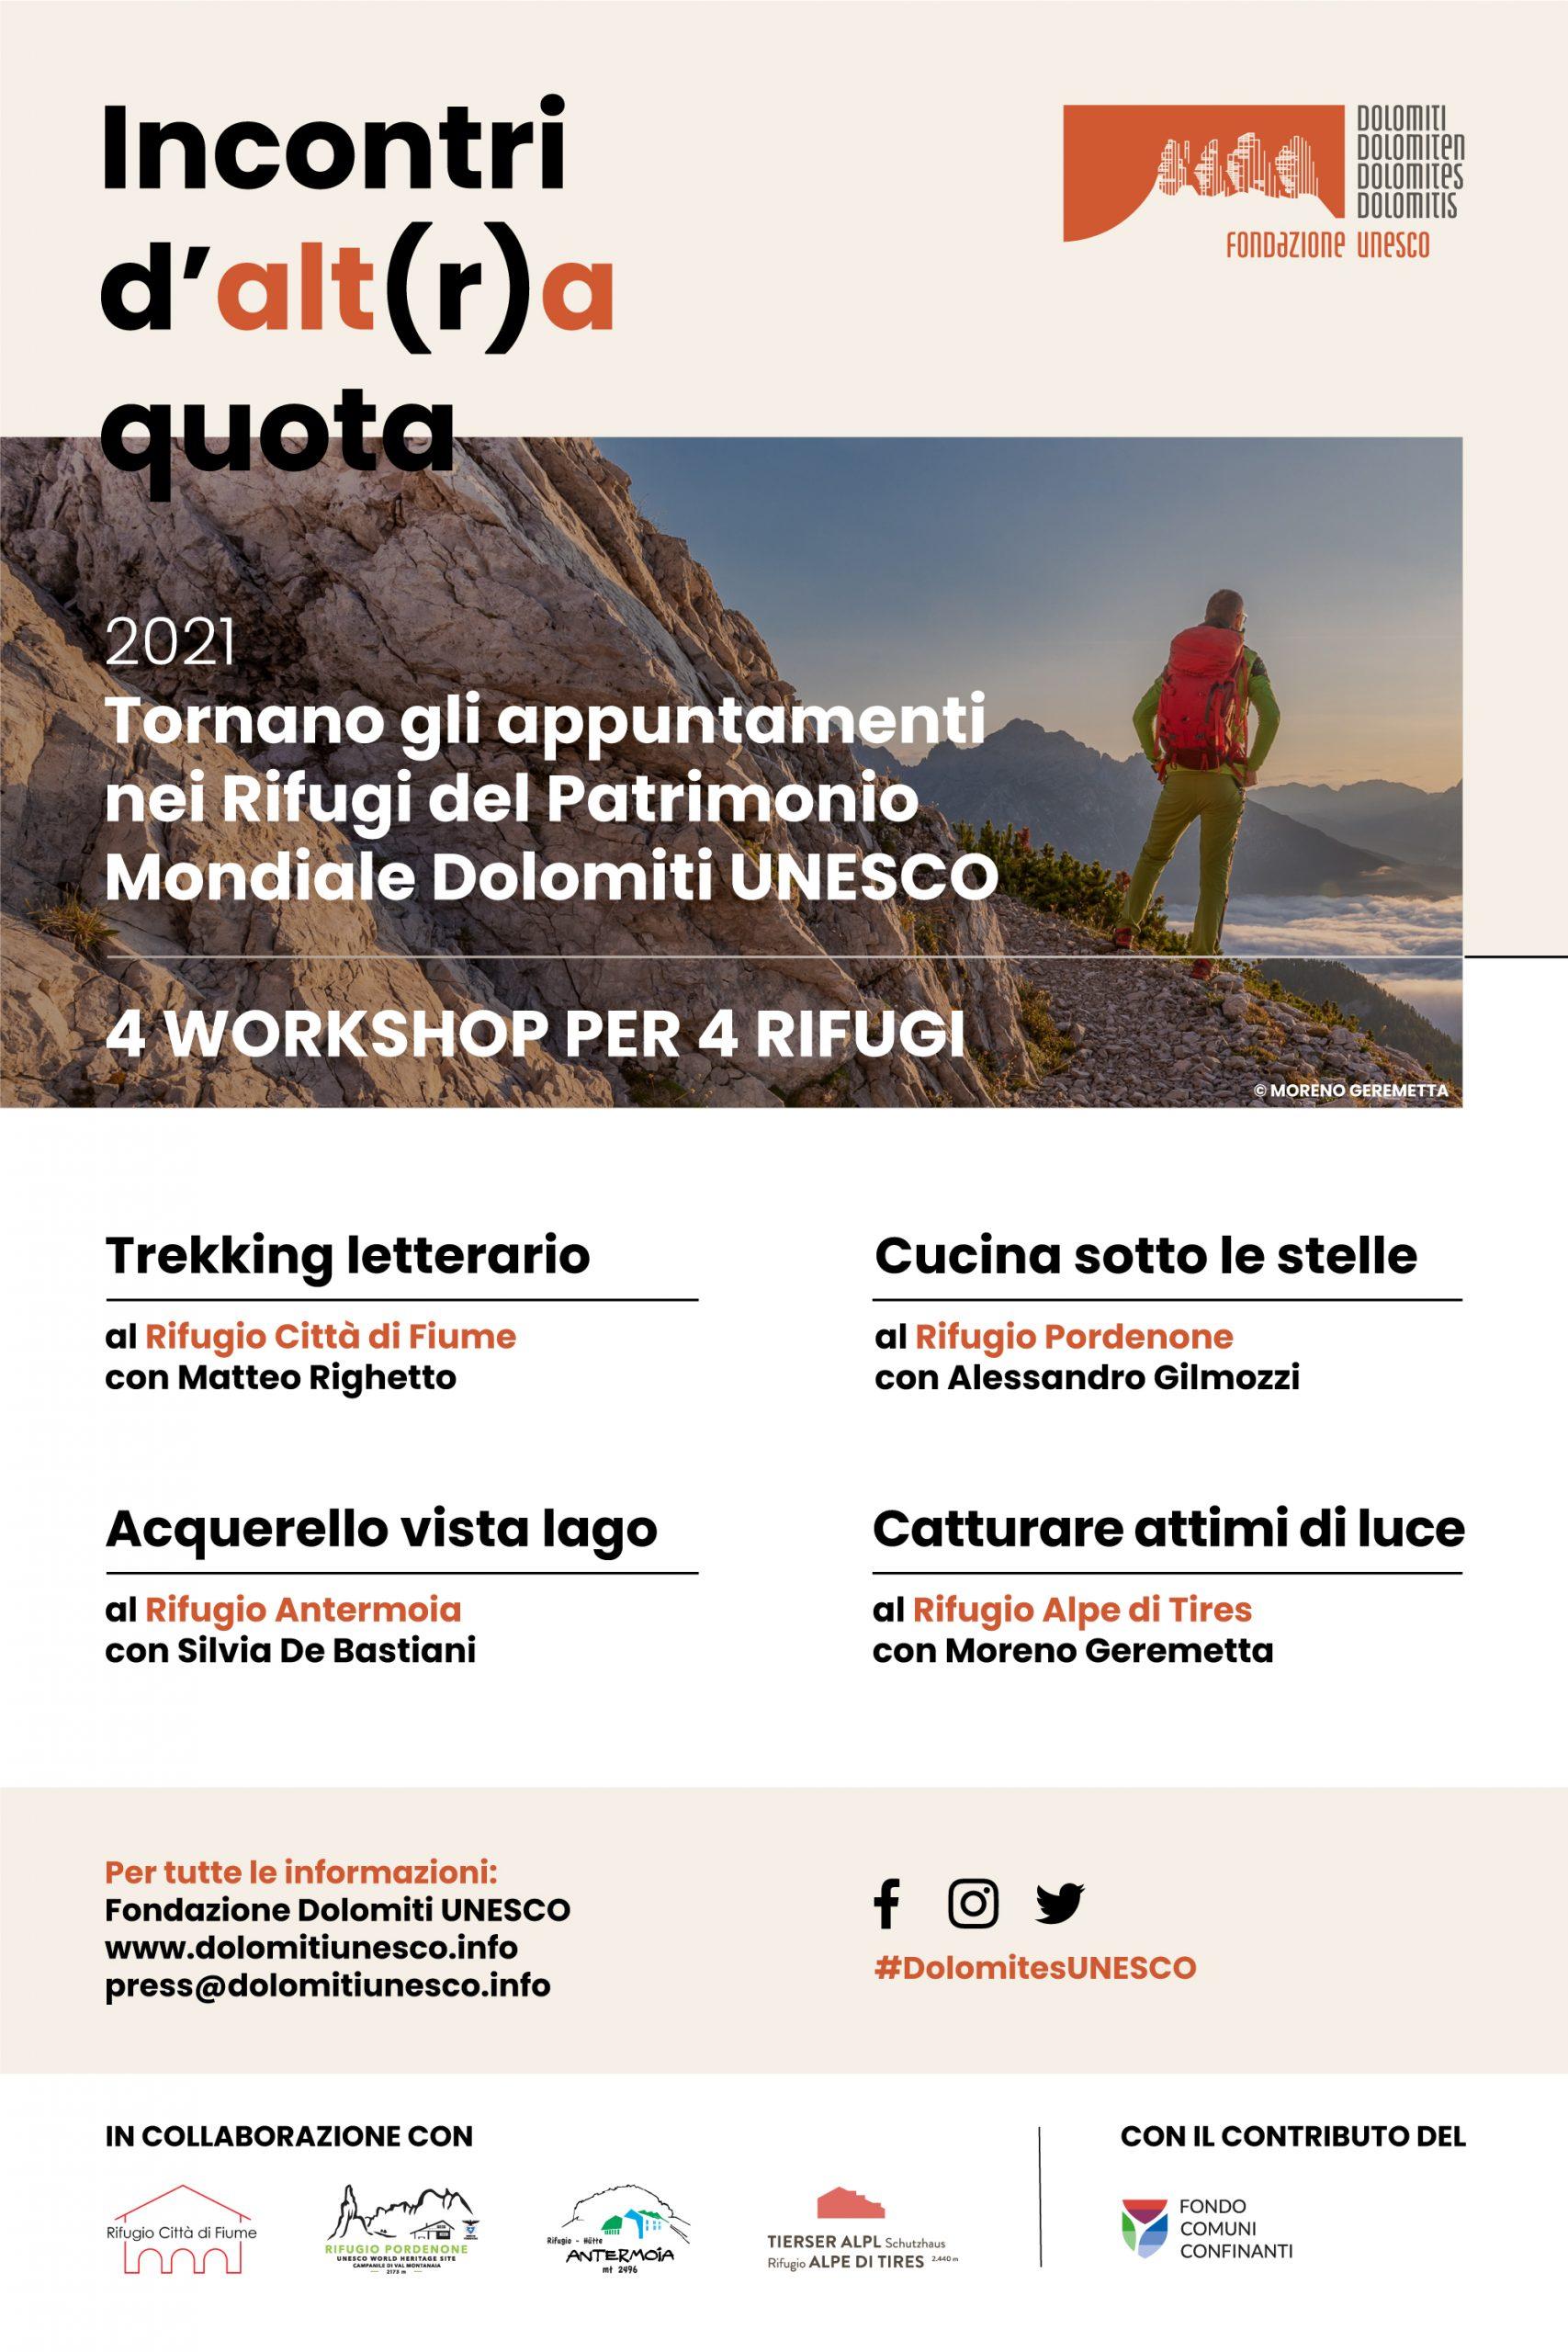 incontri-daltra-quota-rifugi-dolomiti-unesco_2021